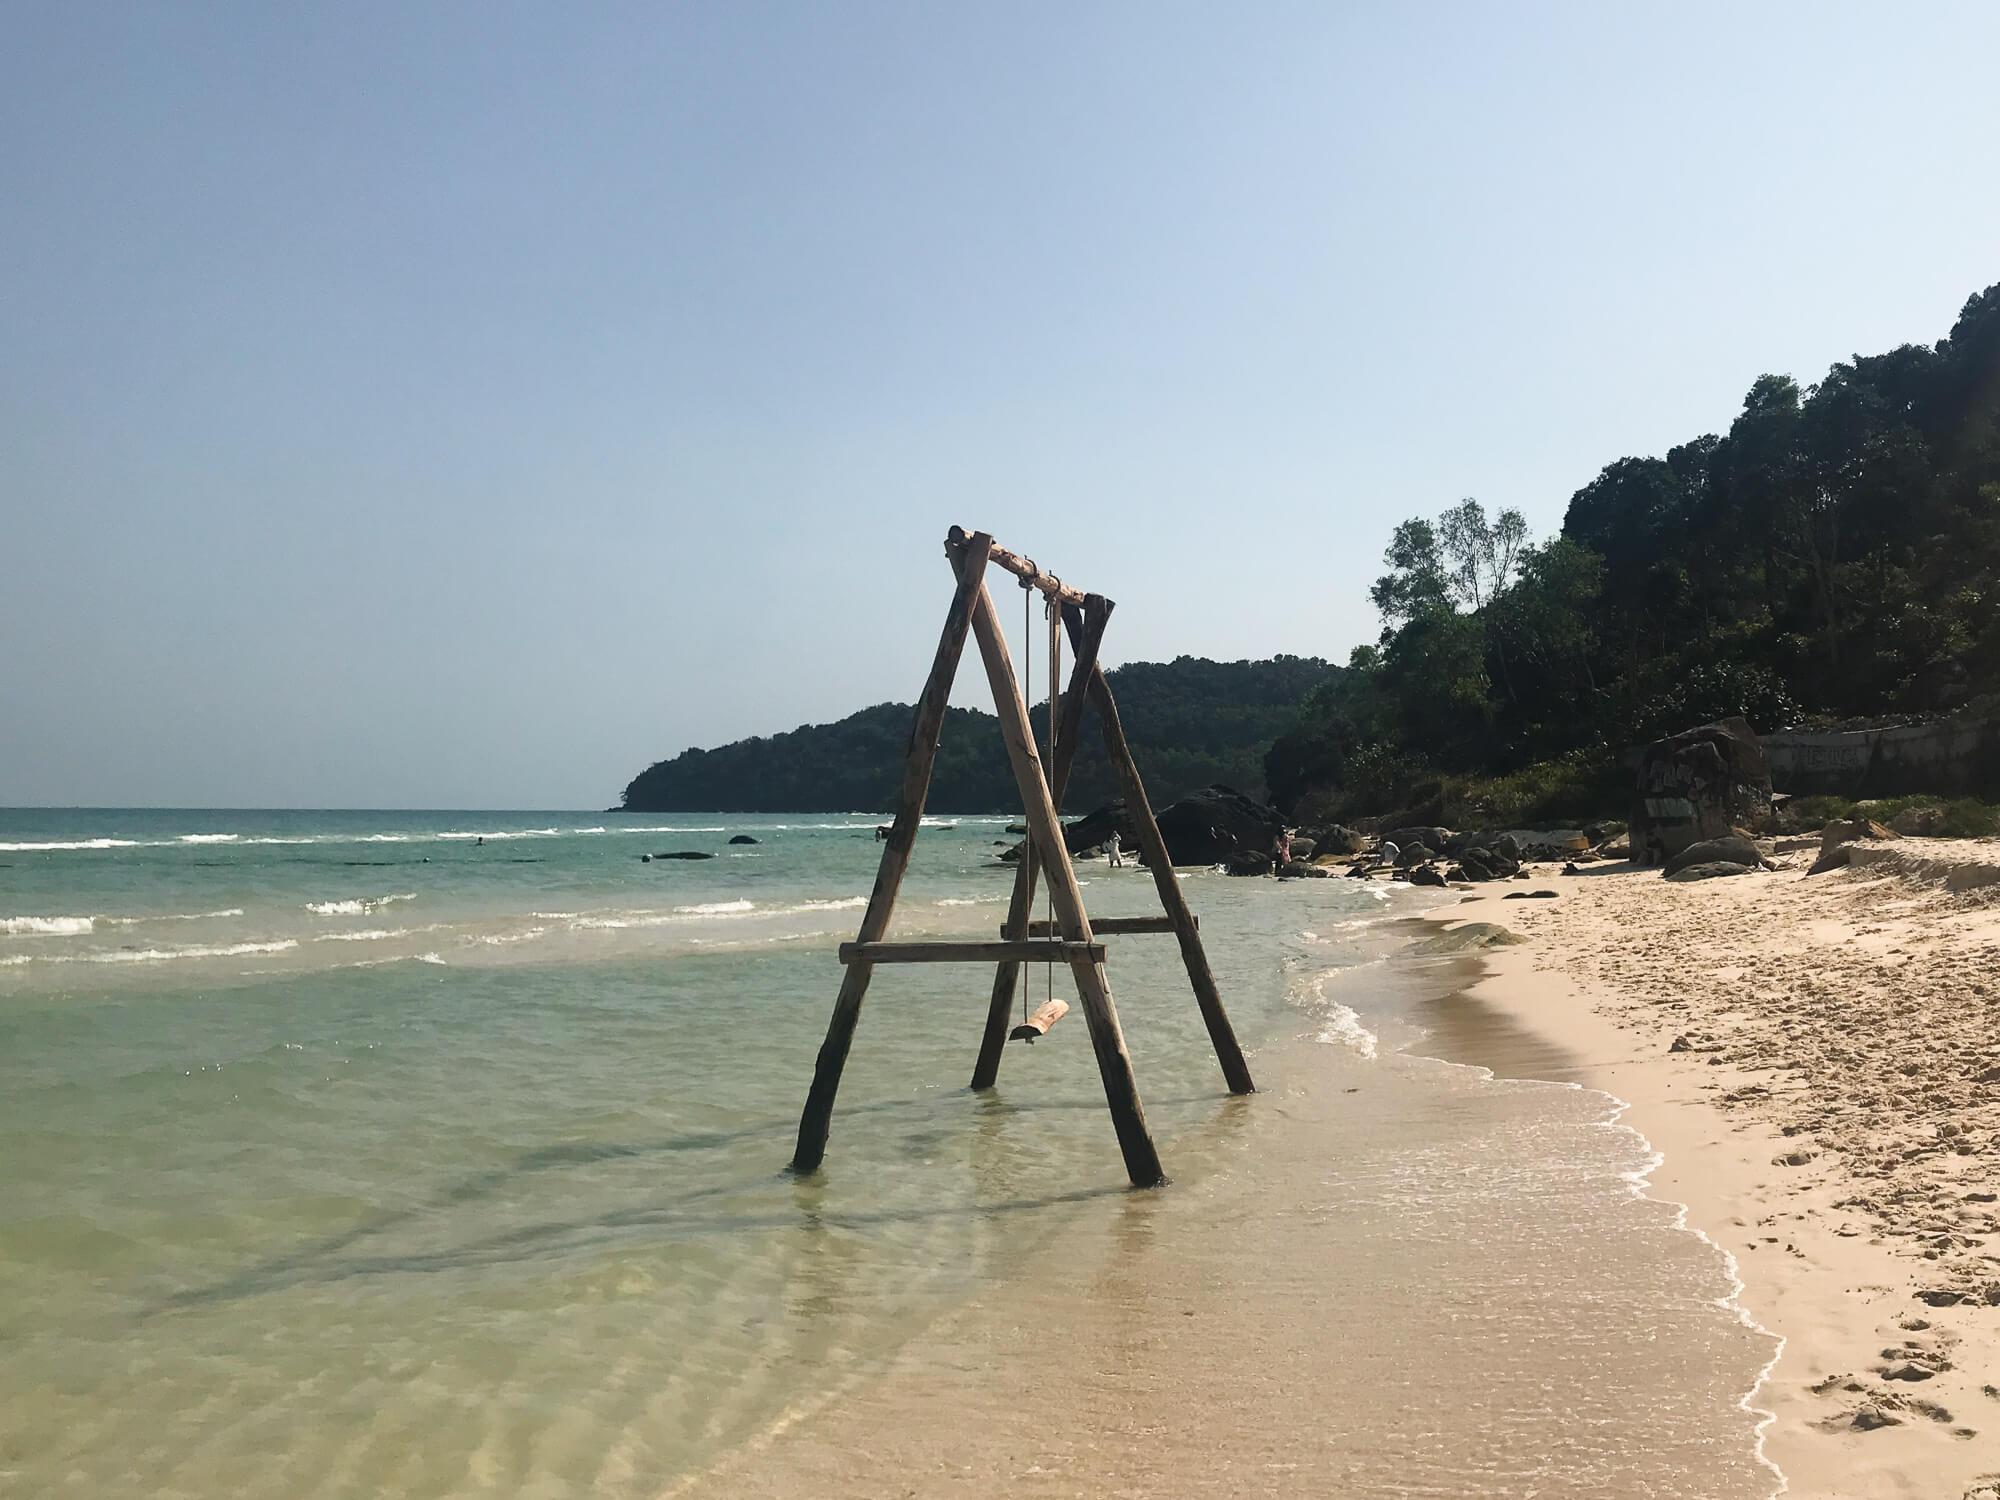 Bao Sao Beach on Phu Quoc Island